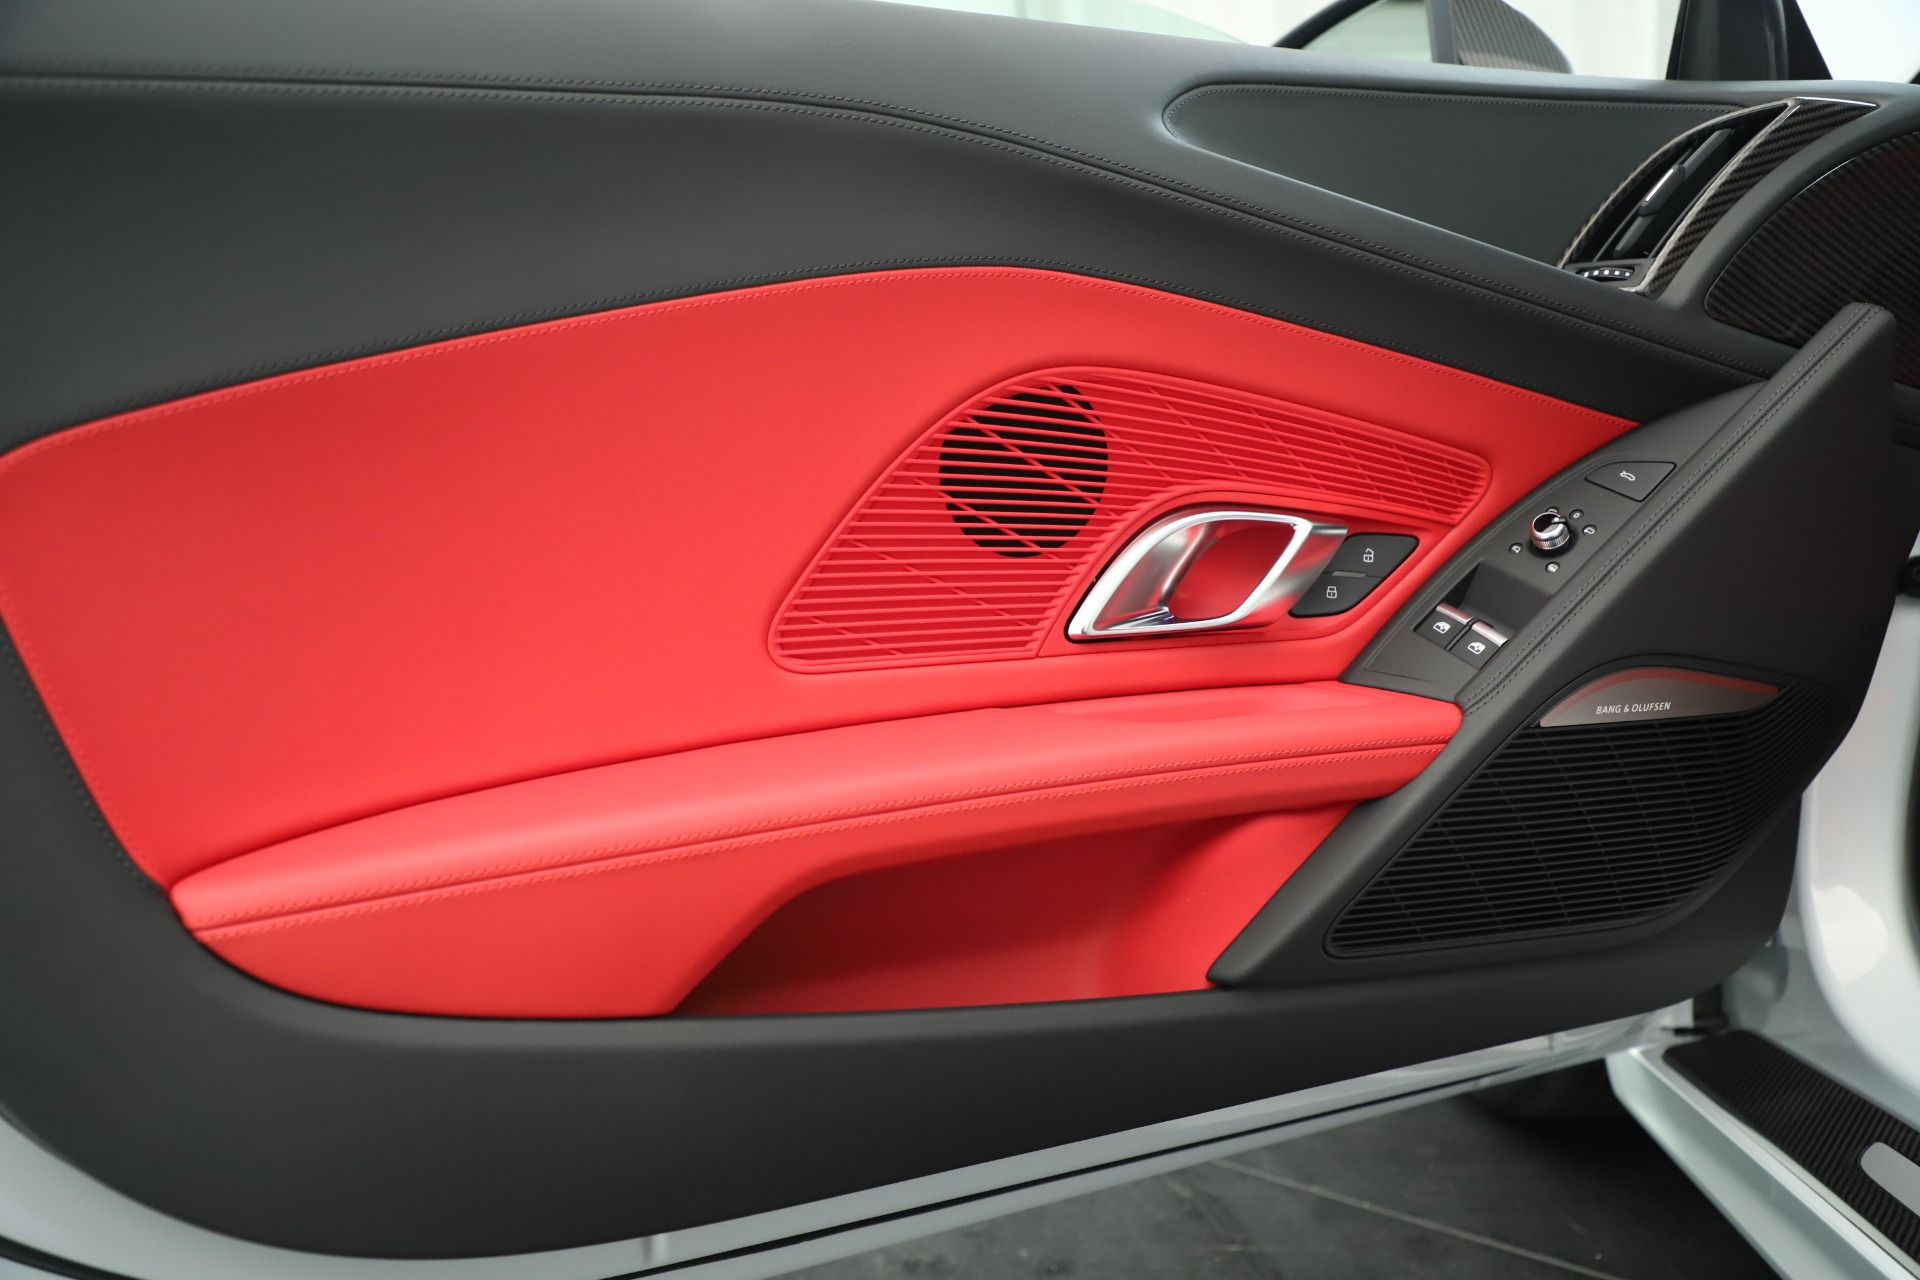 Used 2018 Audi R8 5.2 quattro V10 Plus For Sale In Greenwich, CT 3360_p17